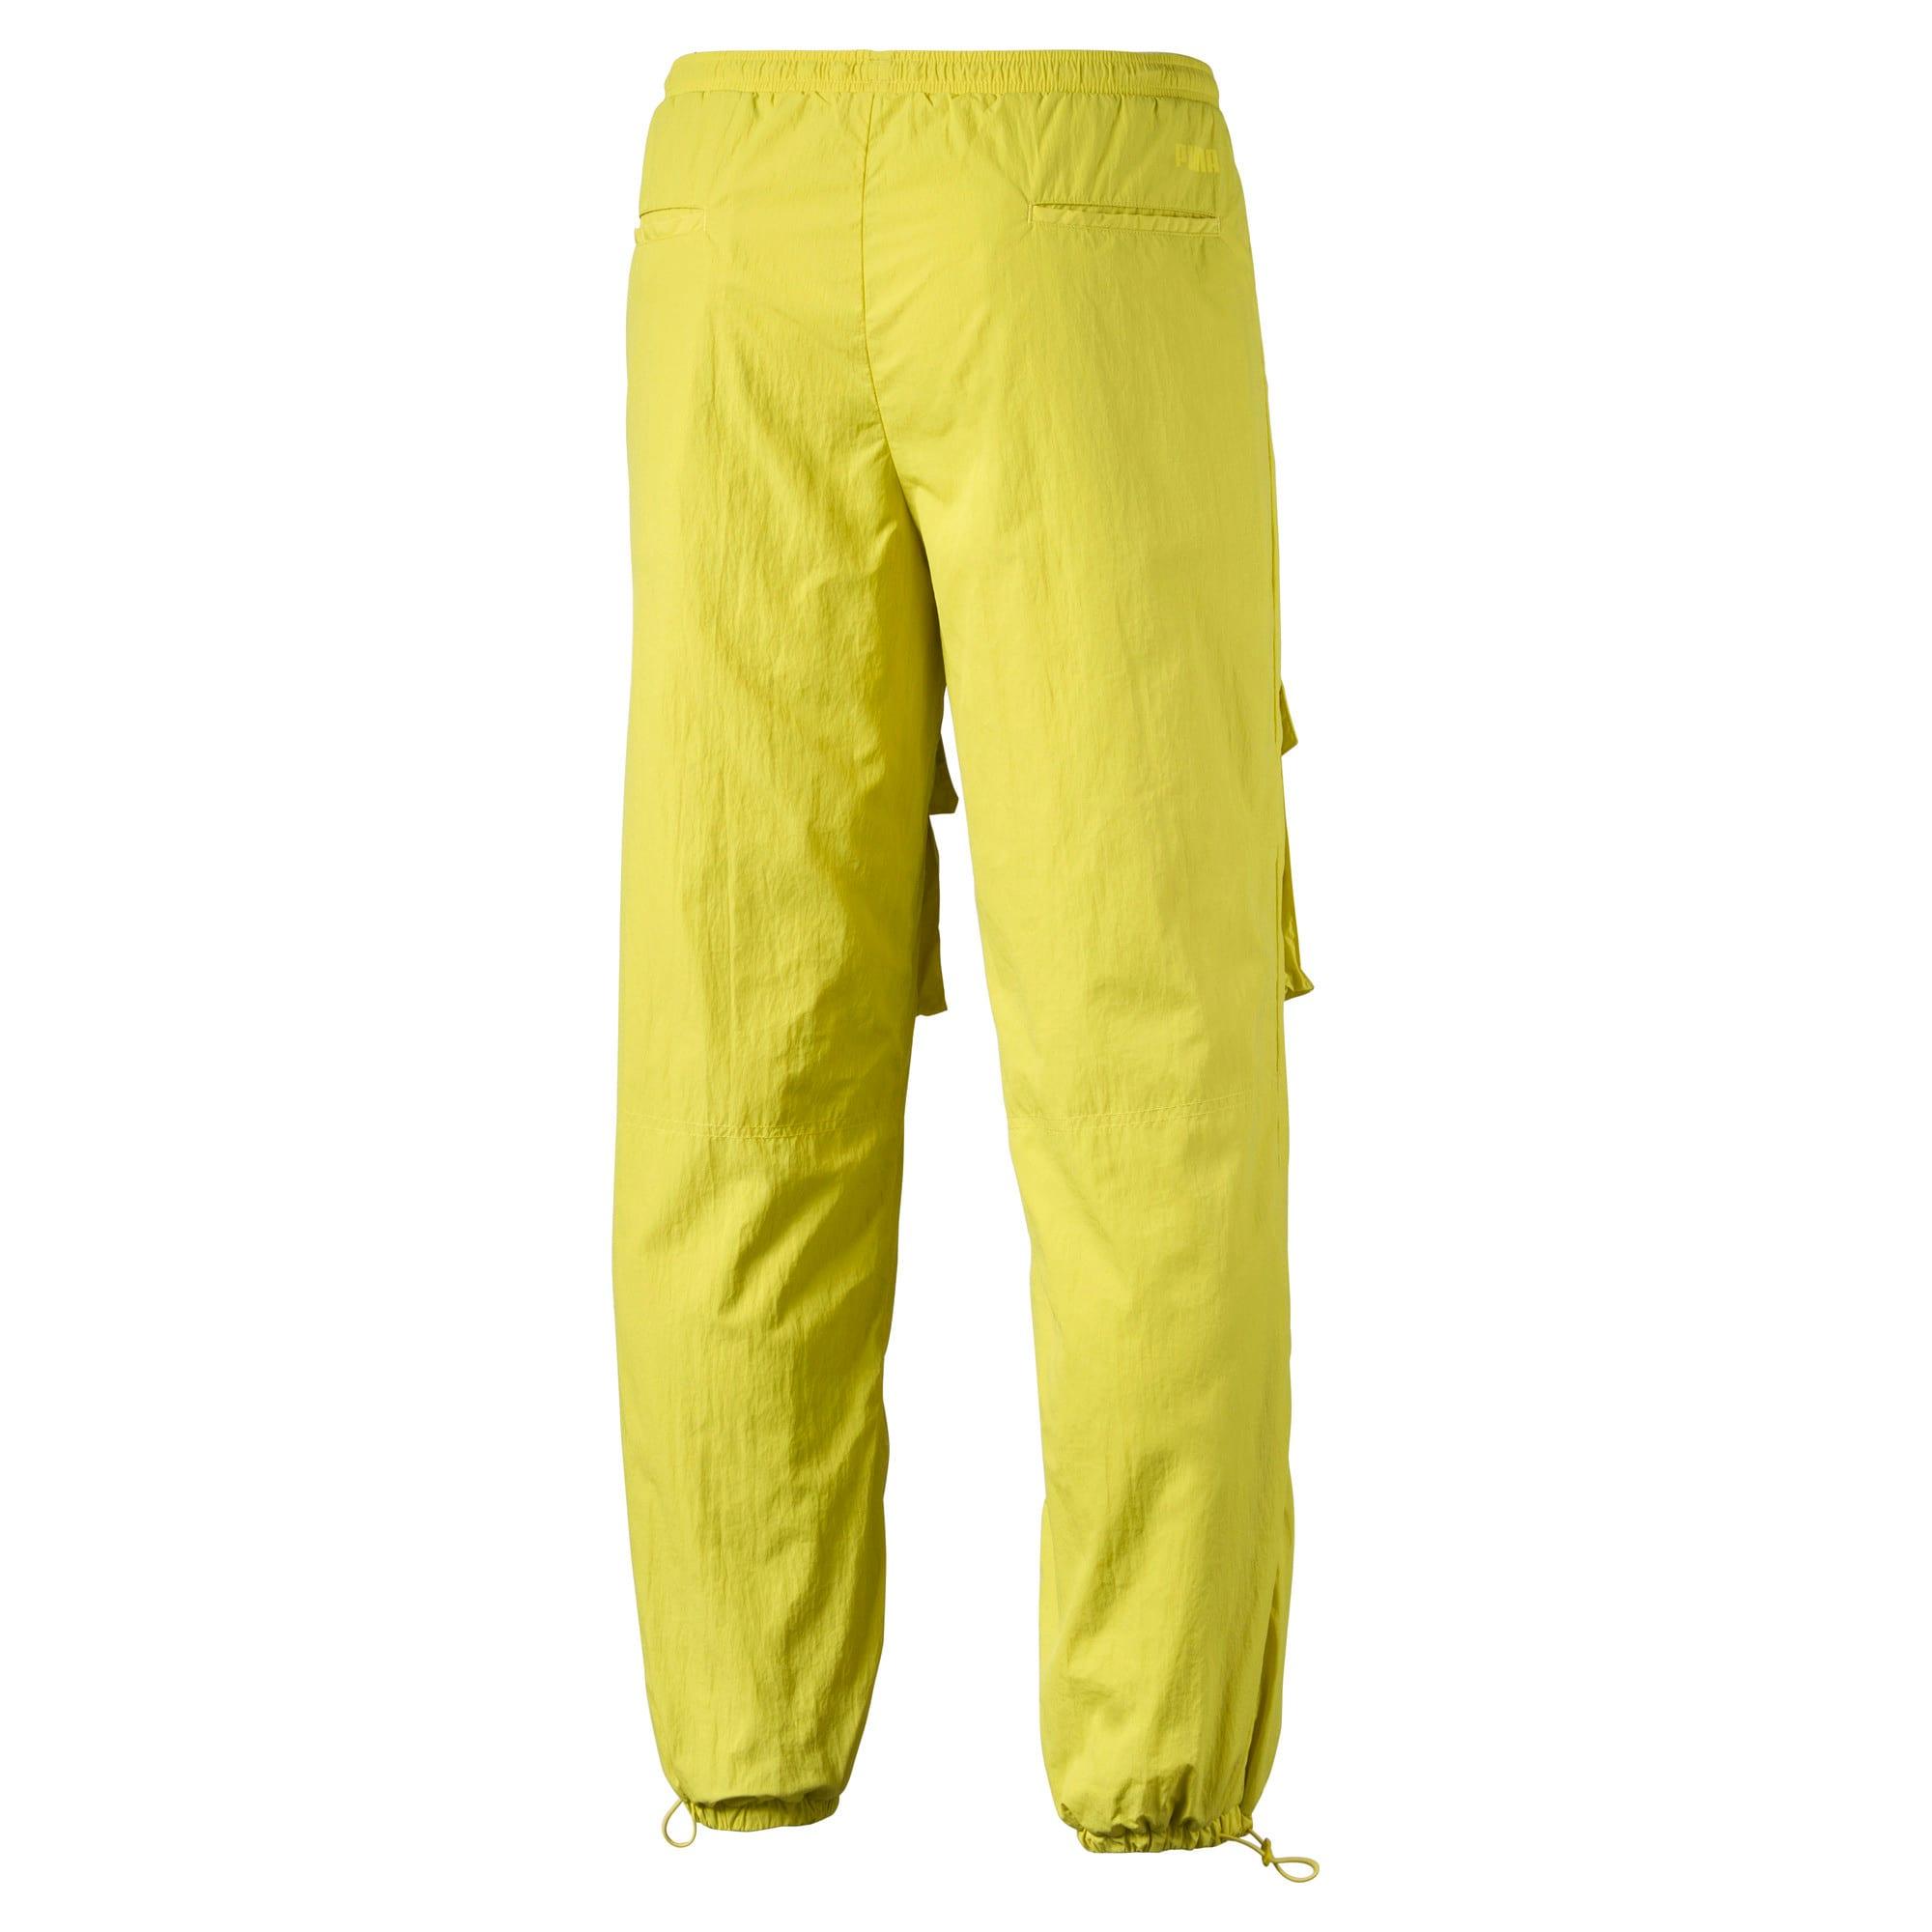 Thumbnail 5 of Alteration Men's Pants, Celery, medium